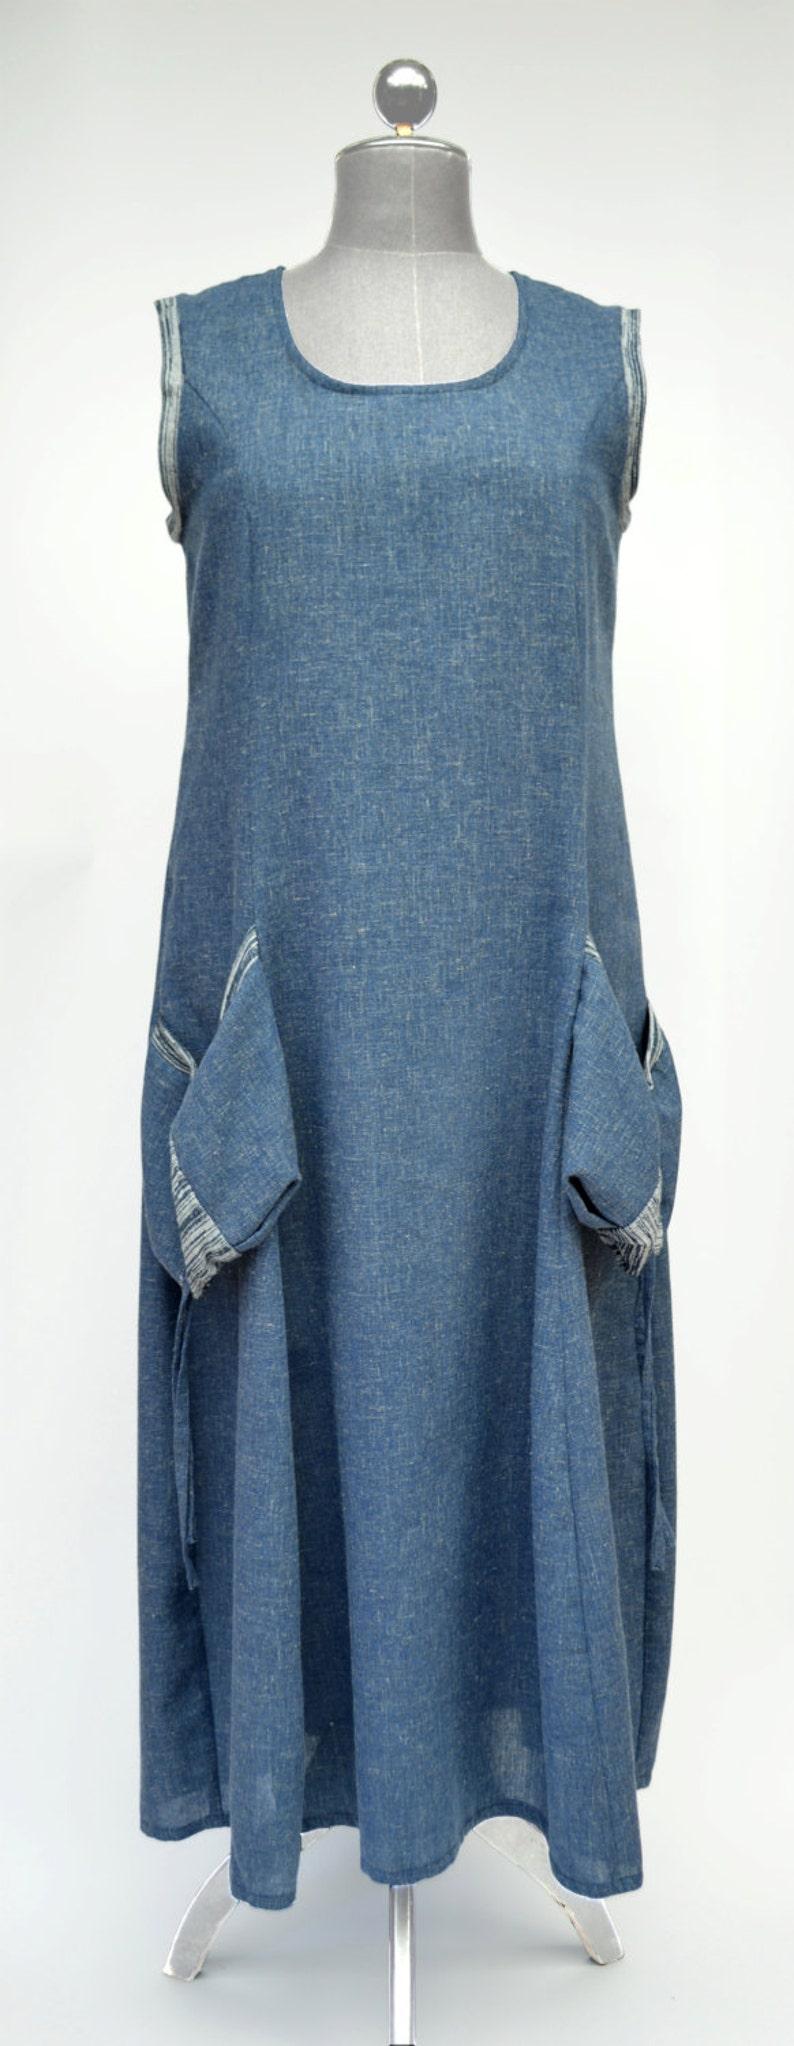 blue gray,plus size,denim Linen Dress Sophia summer dress XL